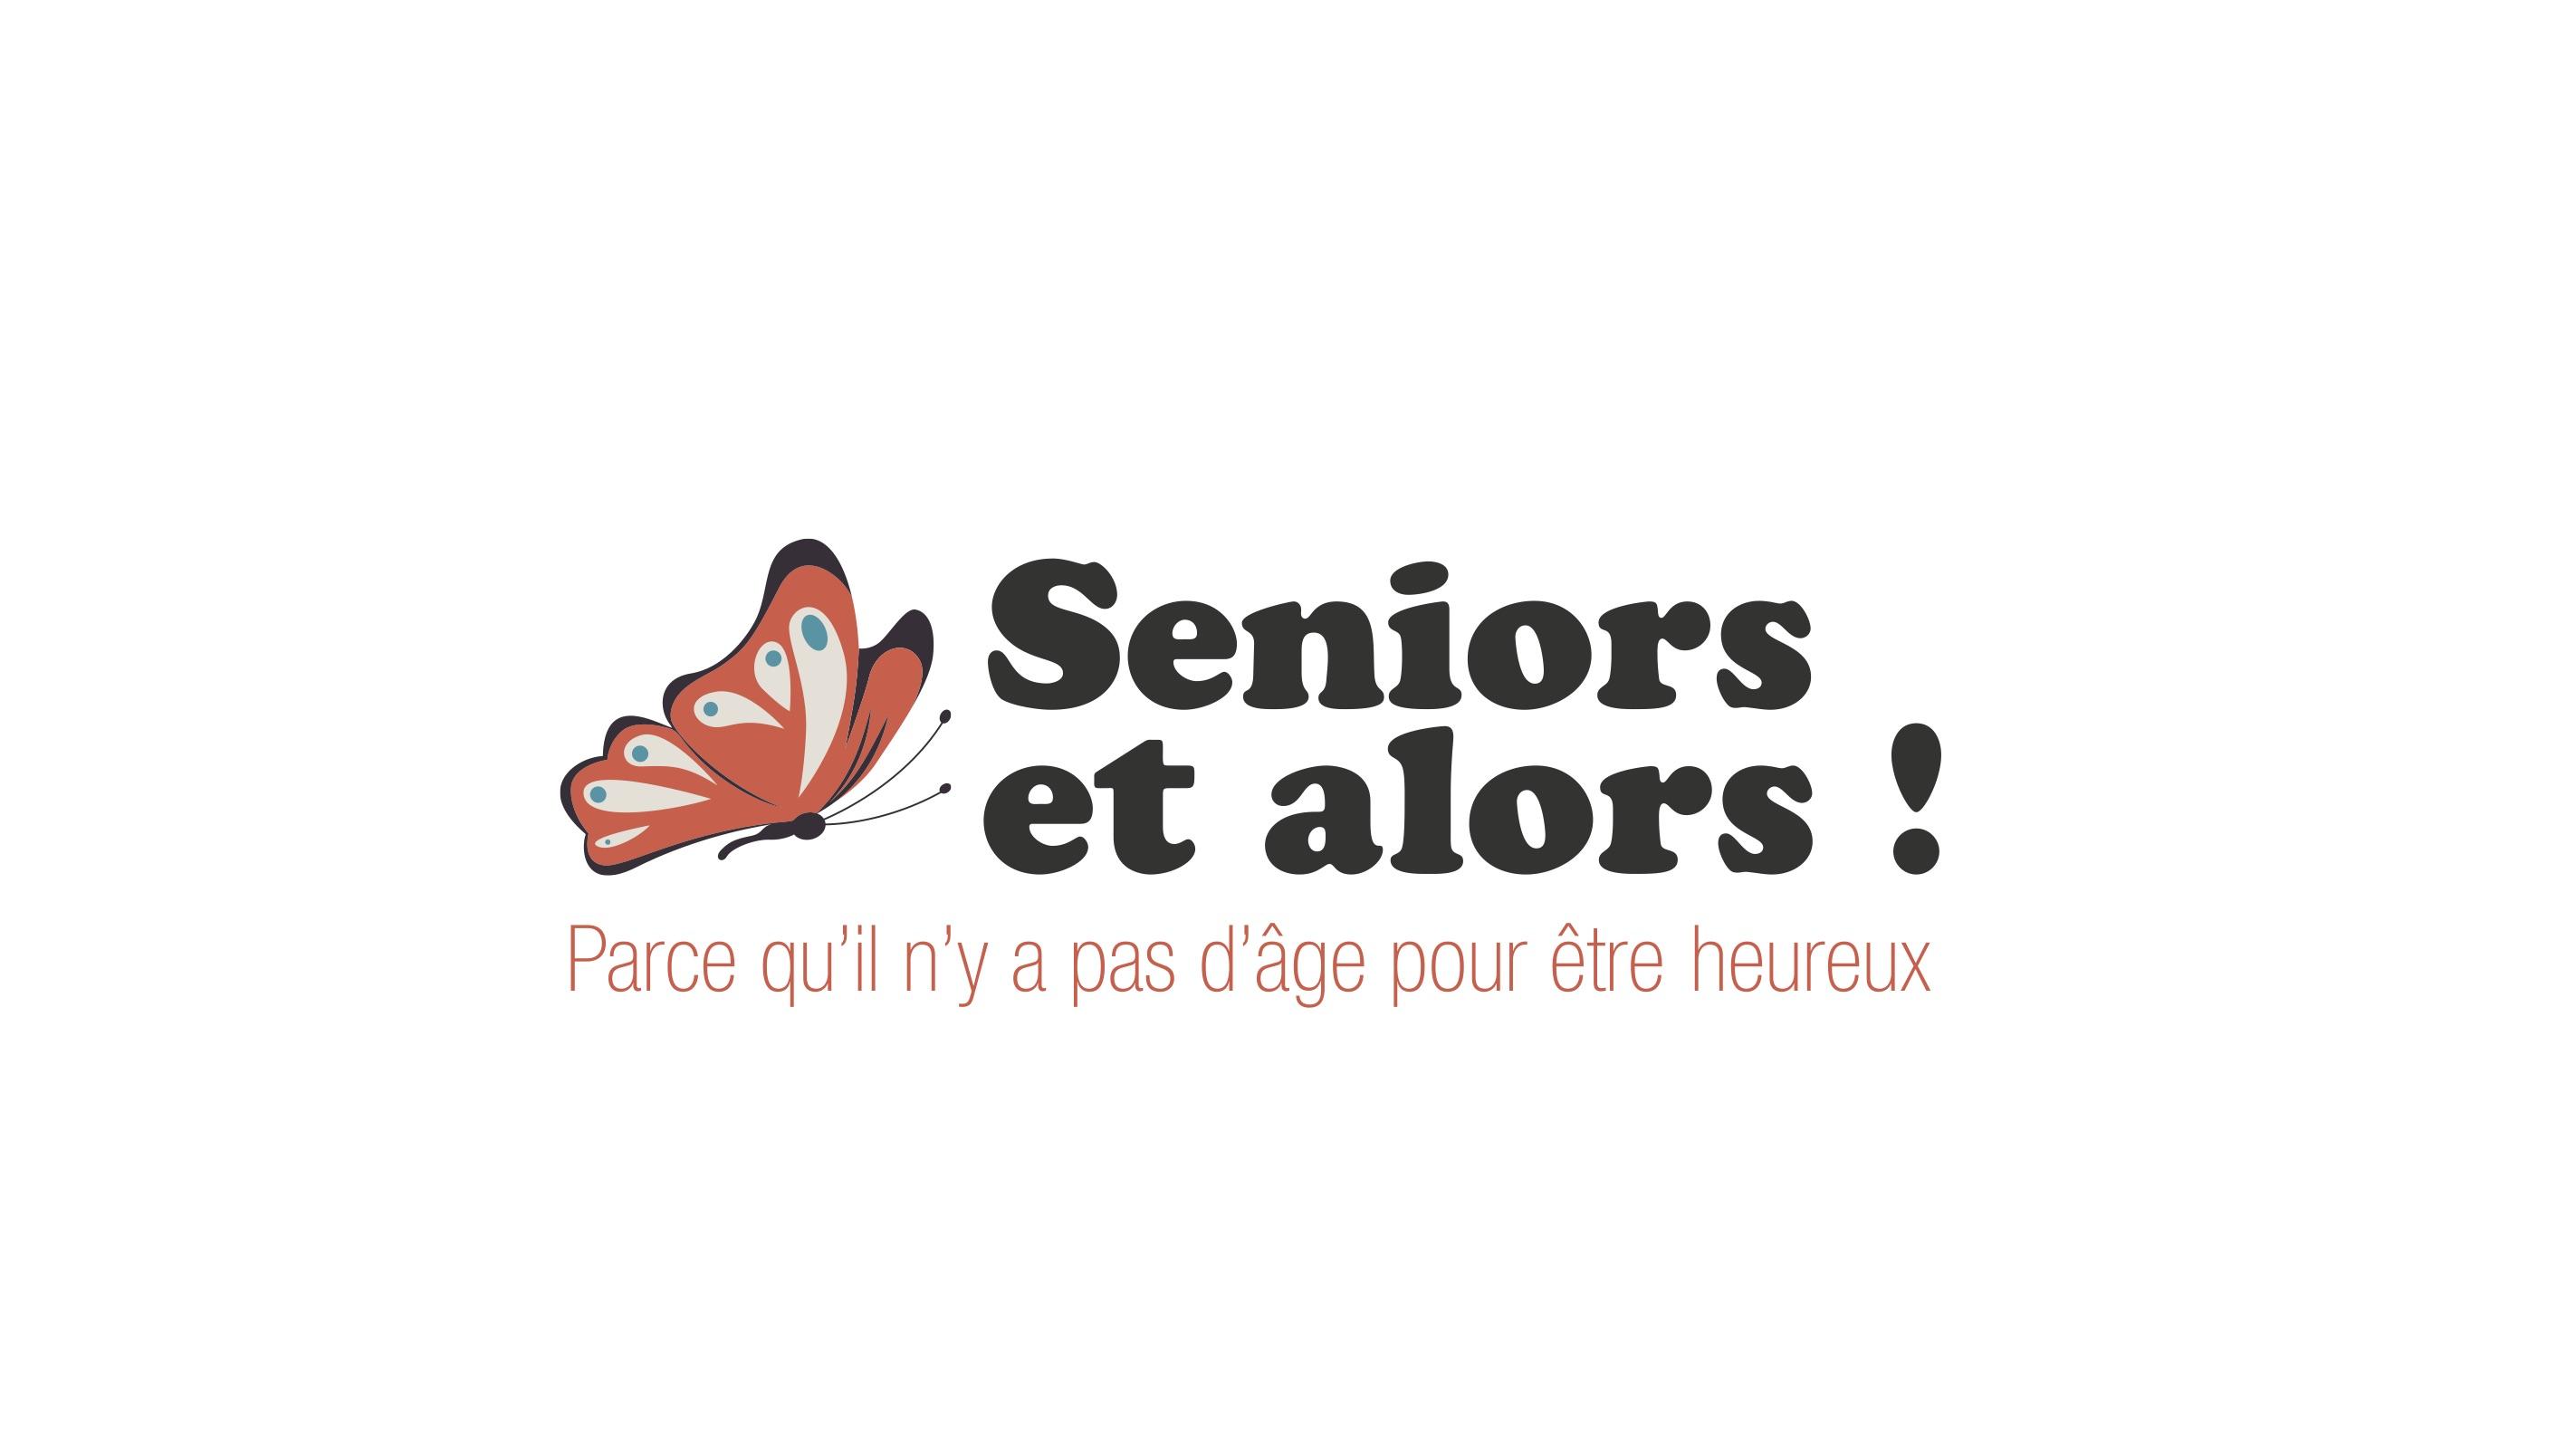 Seniors et alors